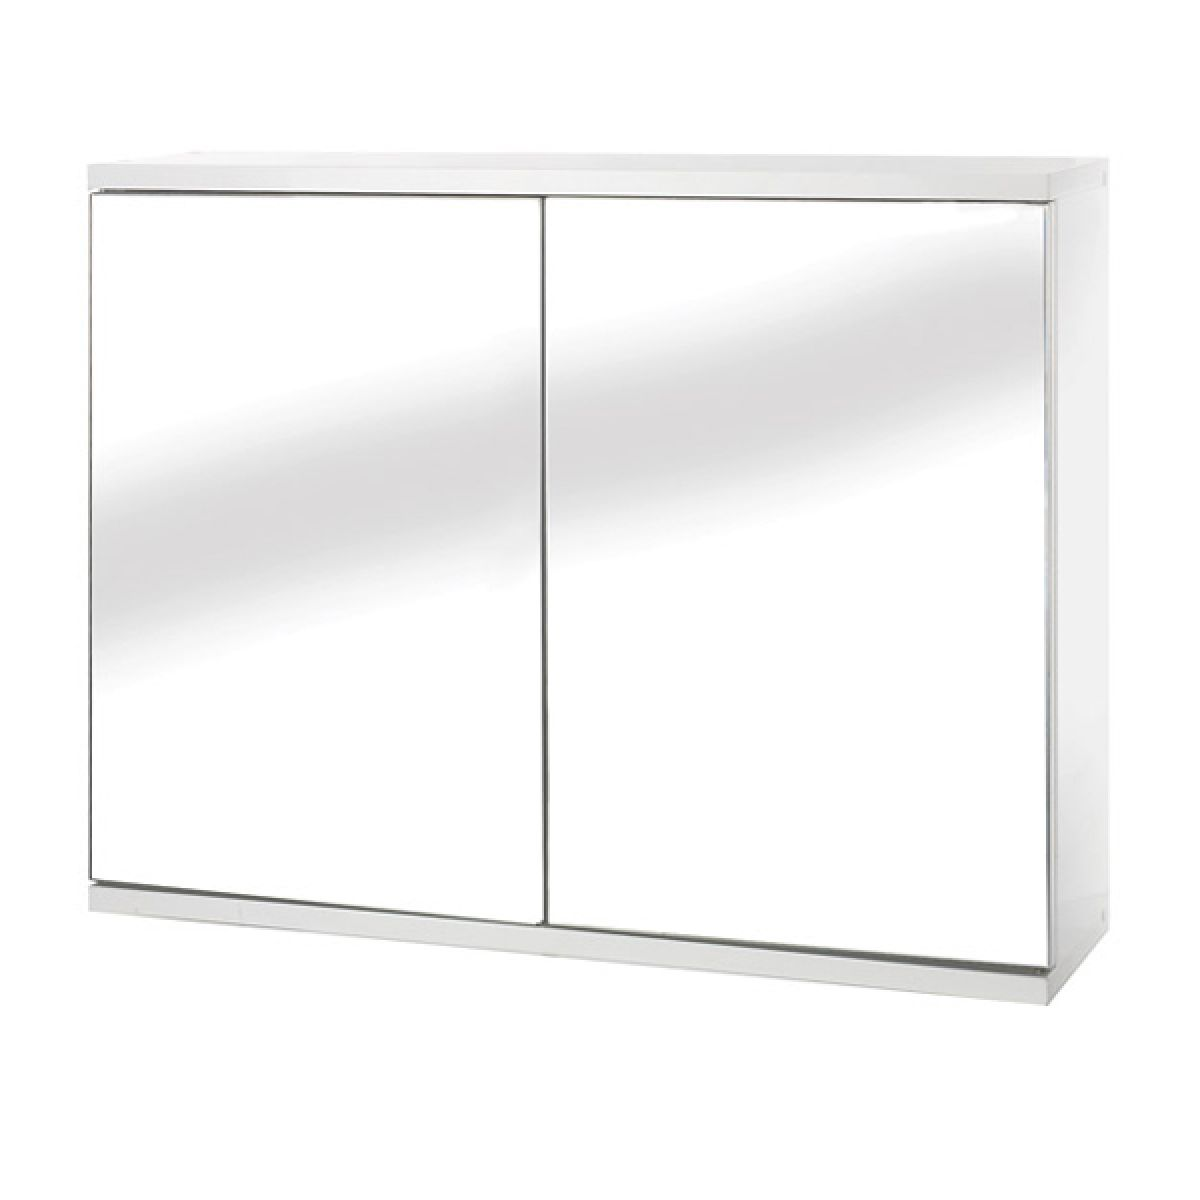 Croydex Simplicity Double Wooden Mirrored Bathroom Cabinet